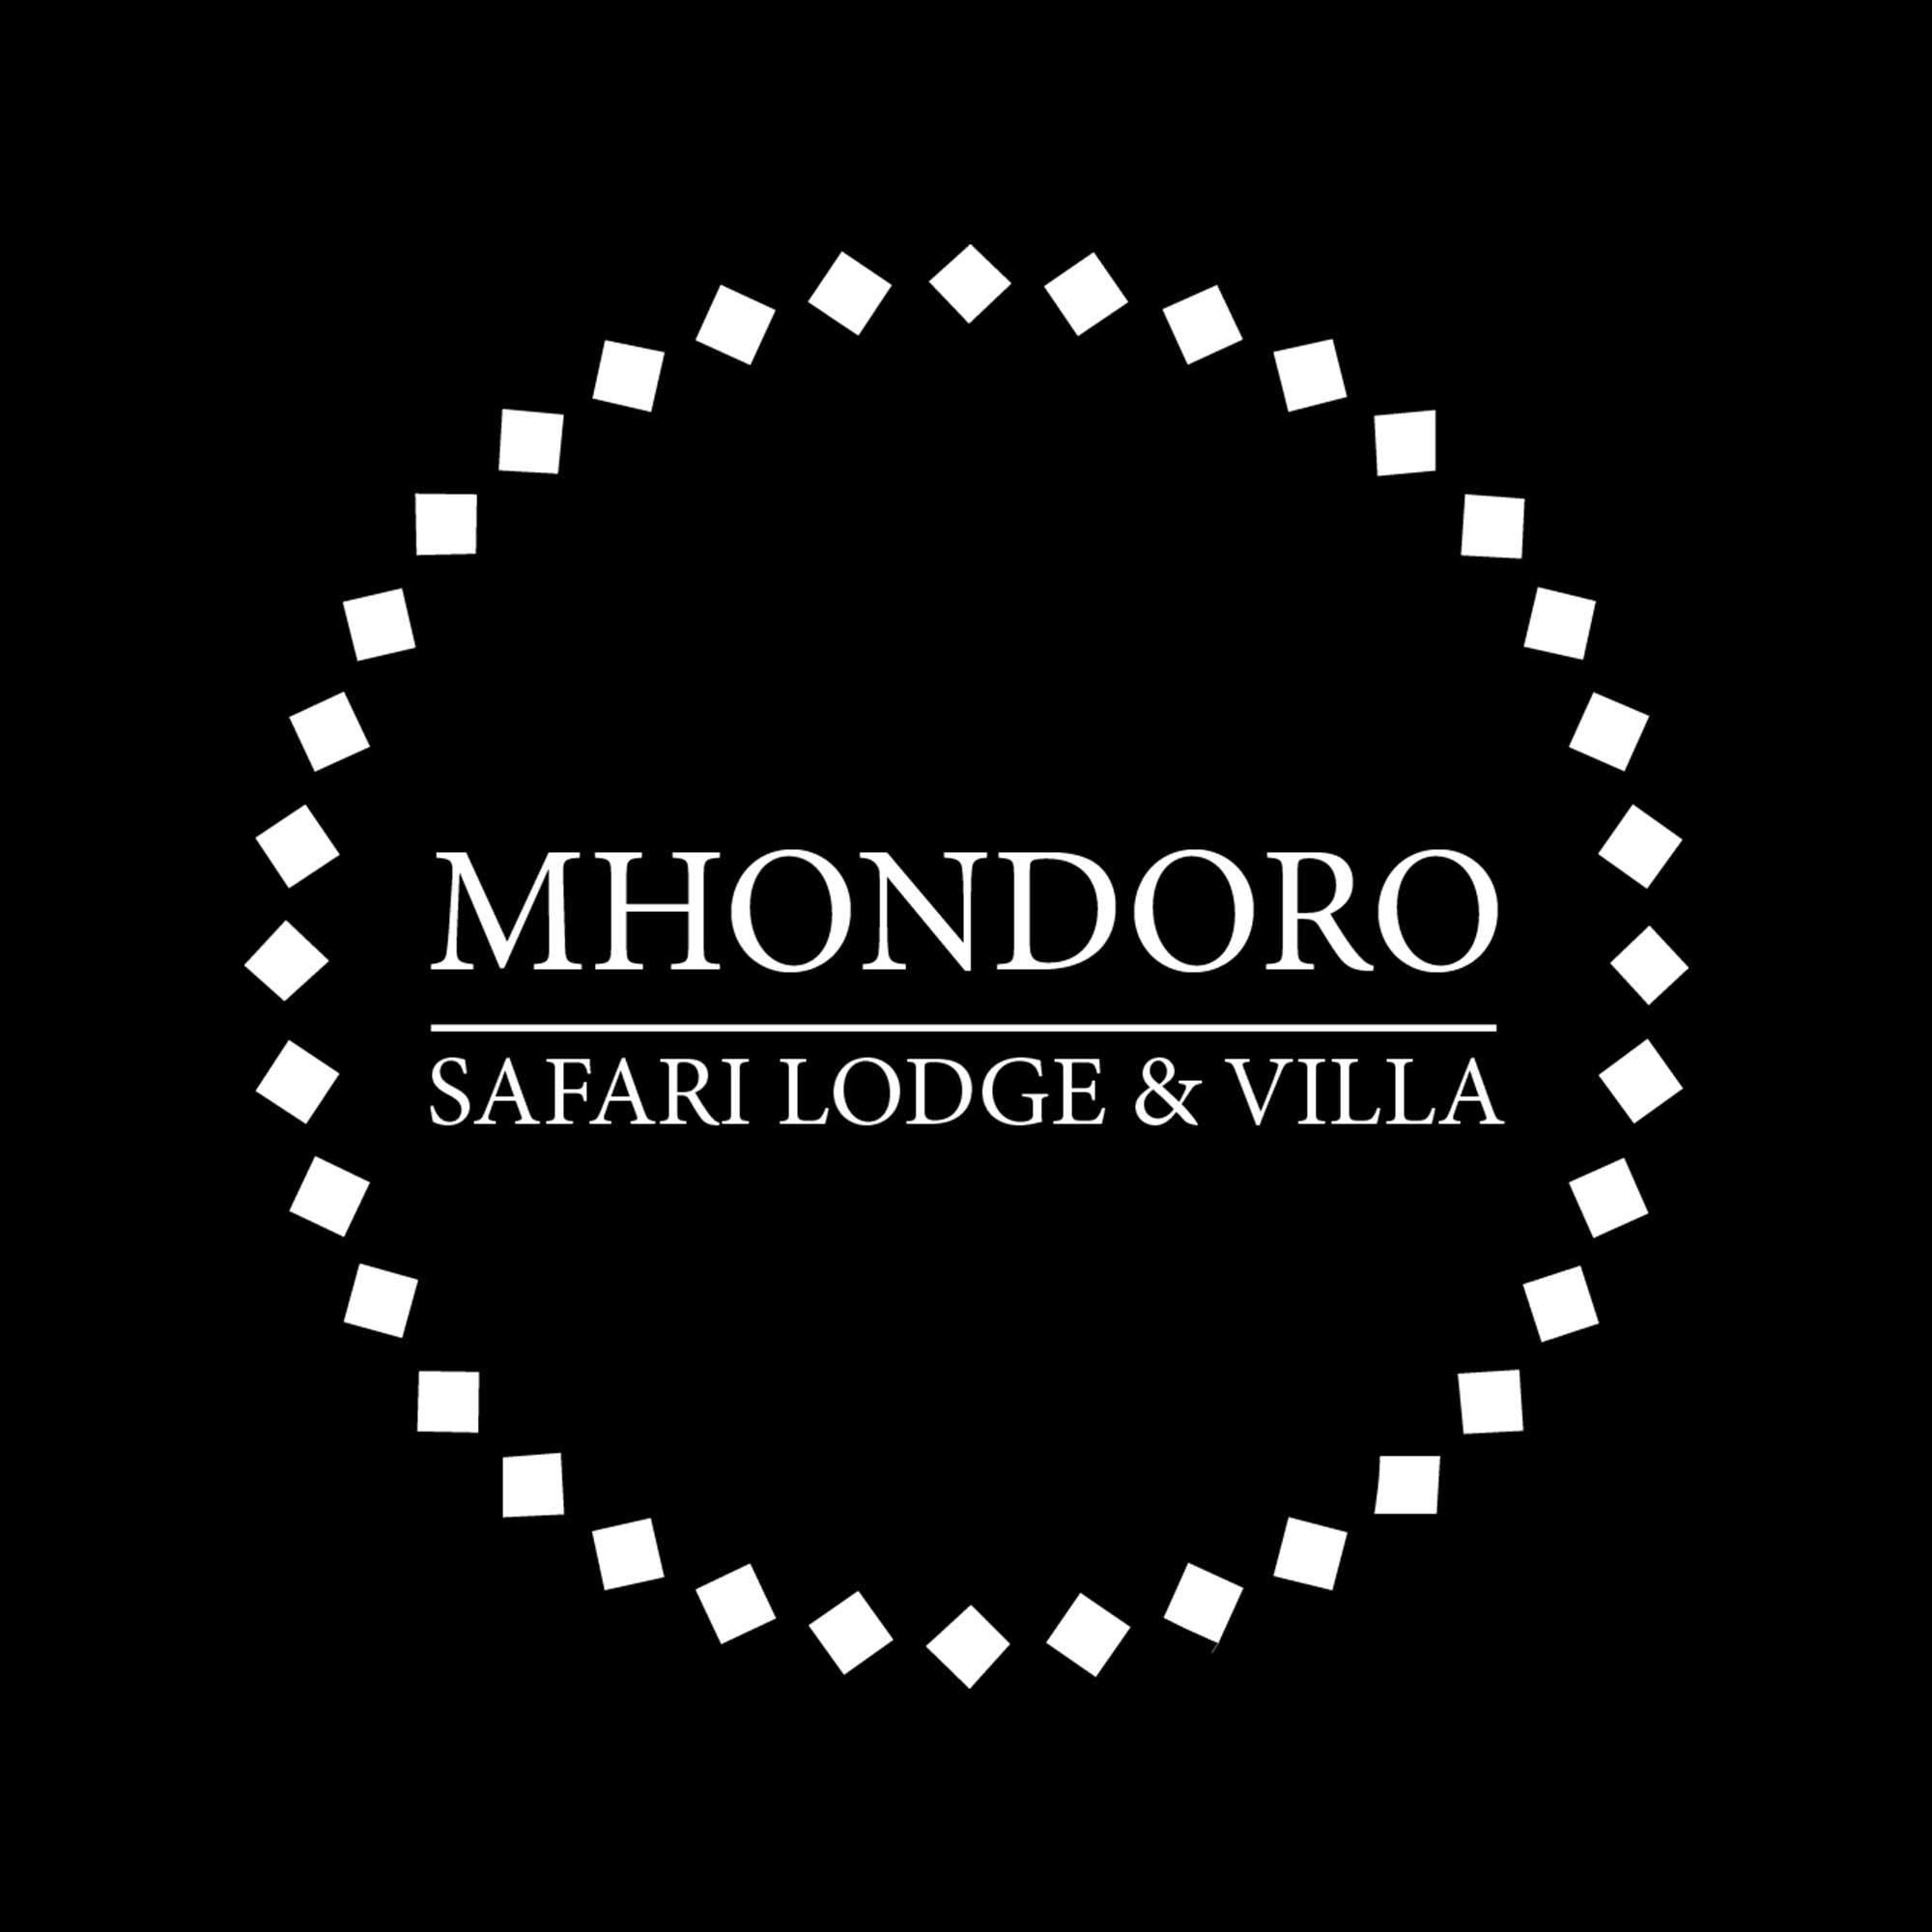 mhondoro-safari-lodge-online-marketing-bureau-webdevelopment-haarlem-made-marketing-5